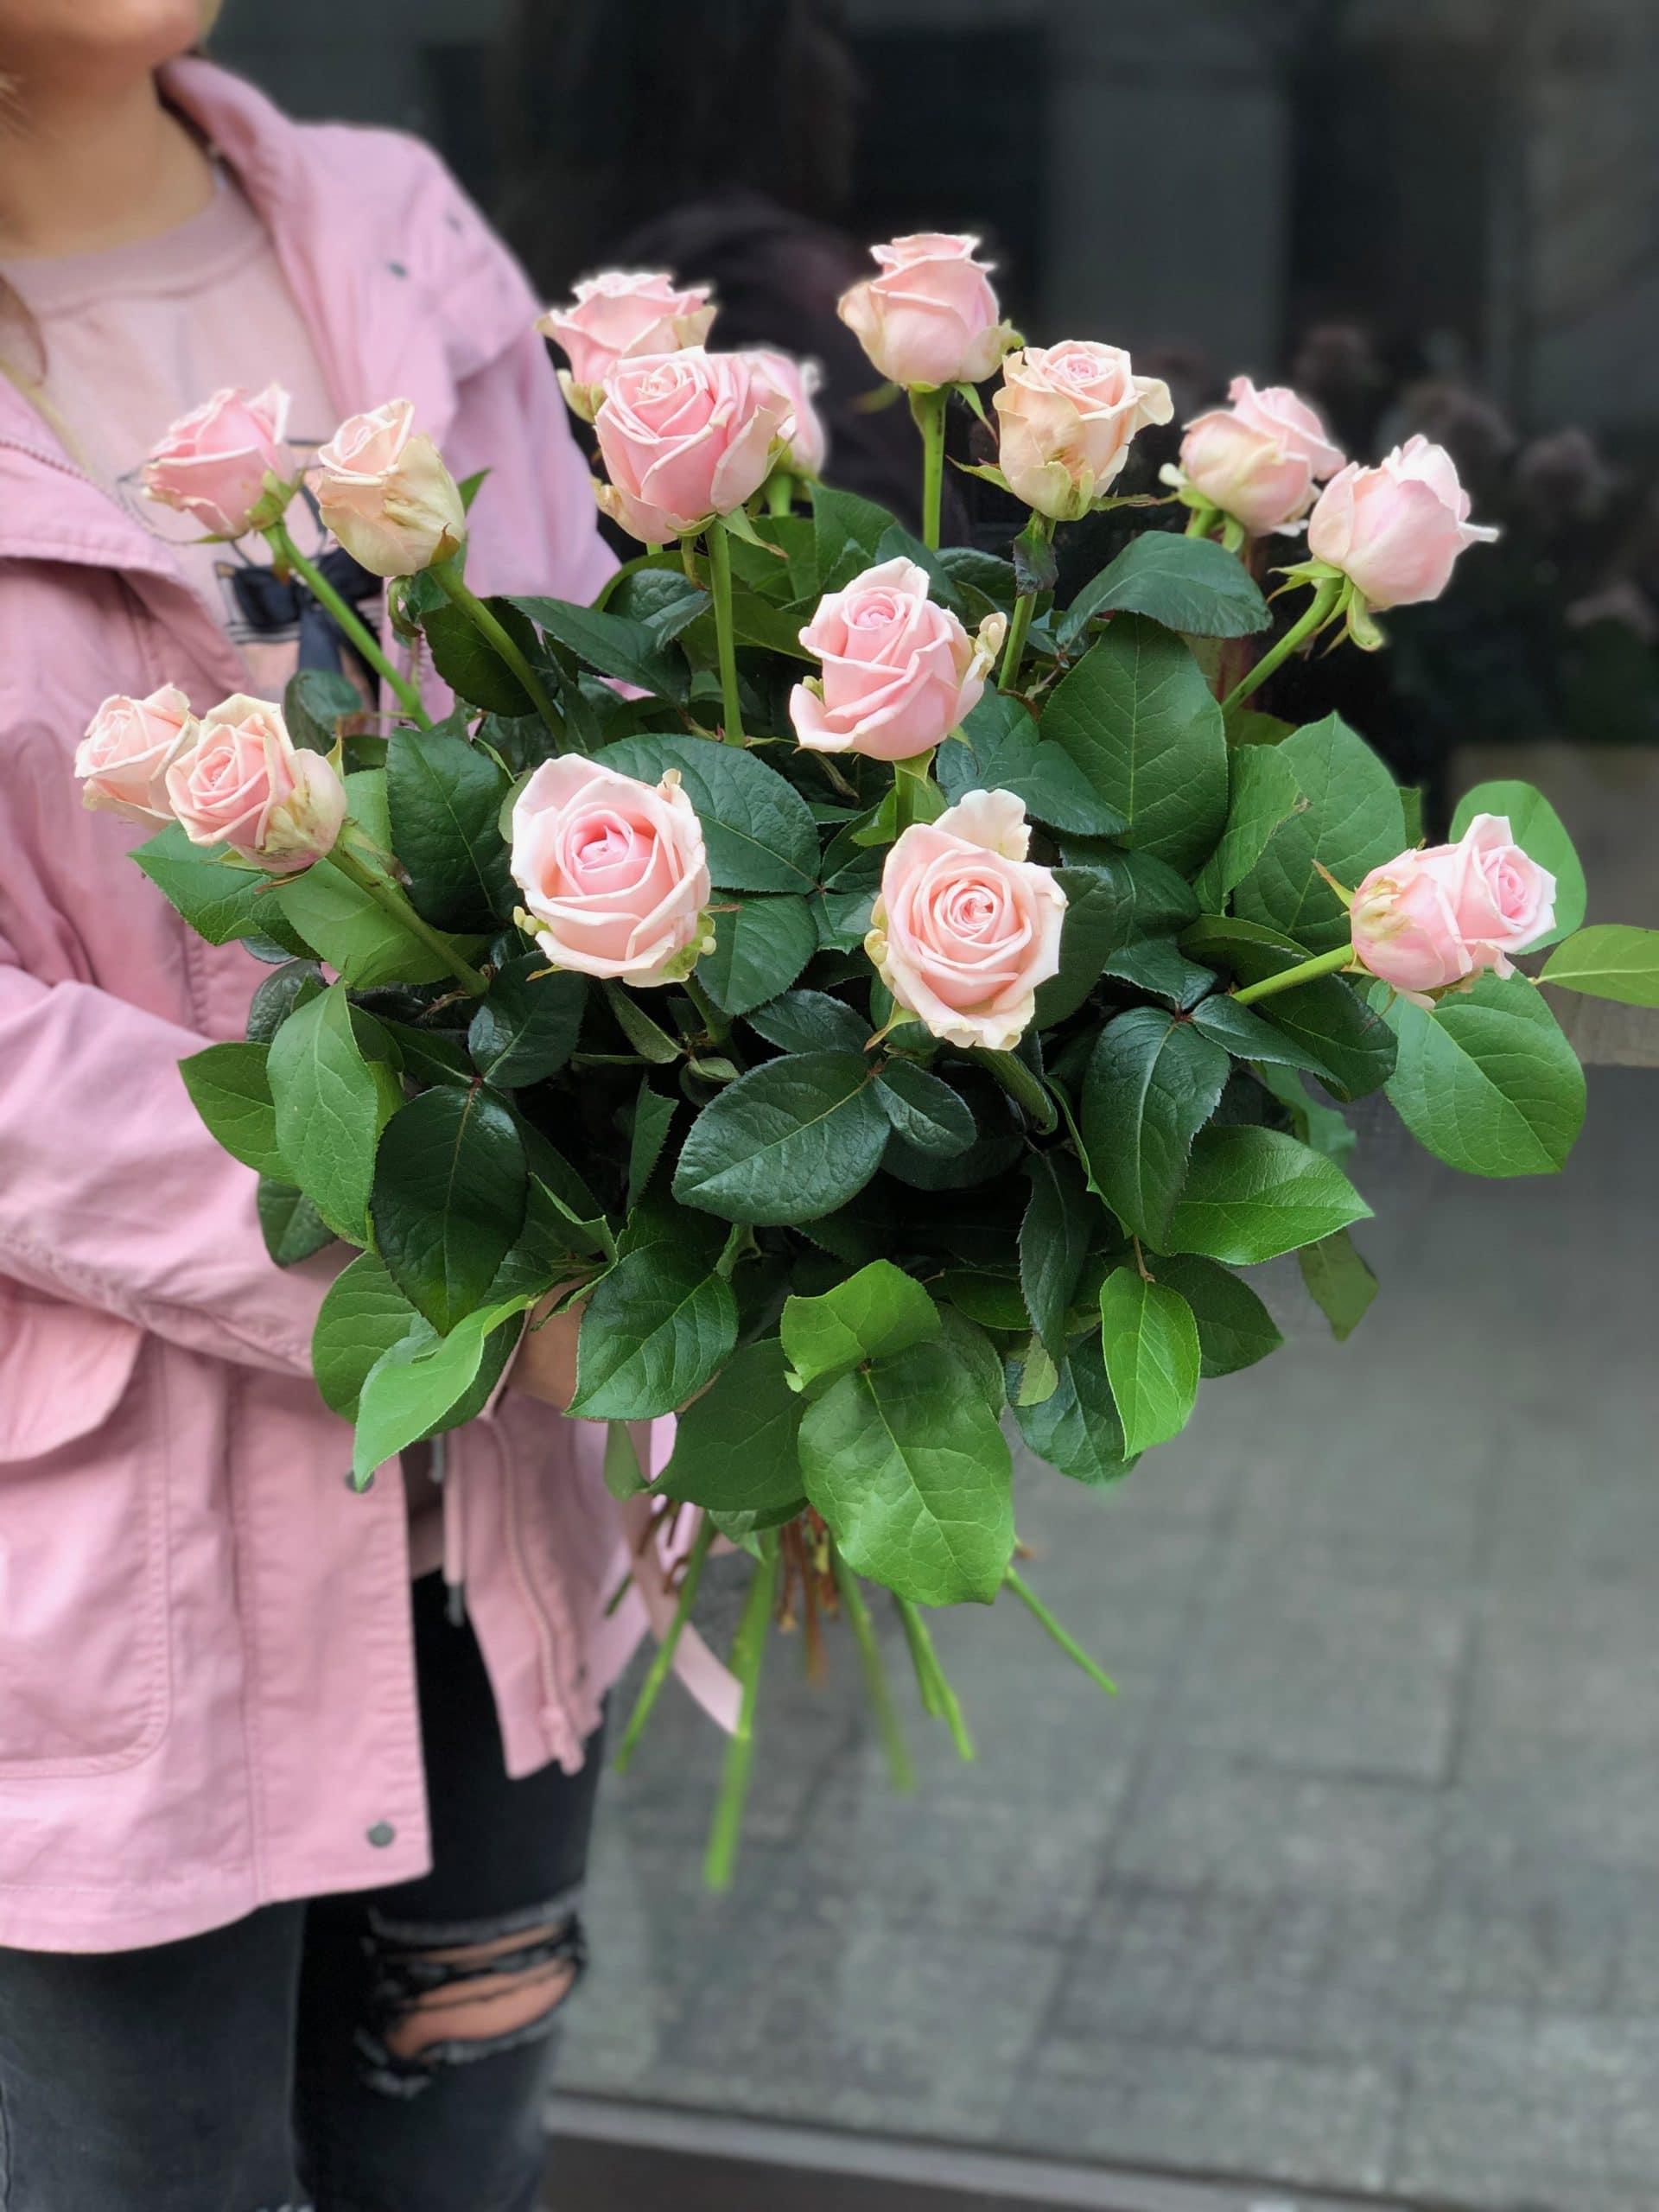 Bukiet Różowe Róże